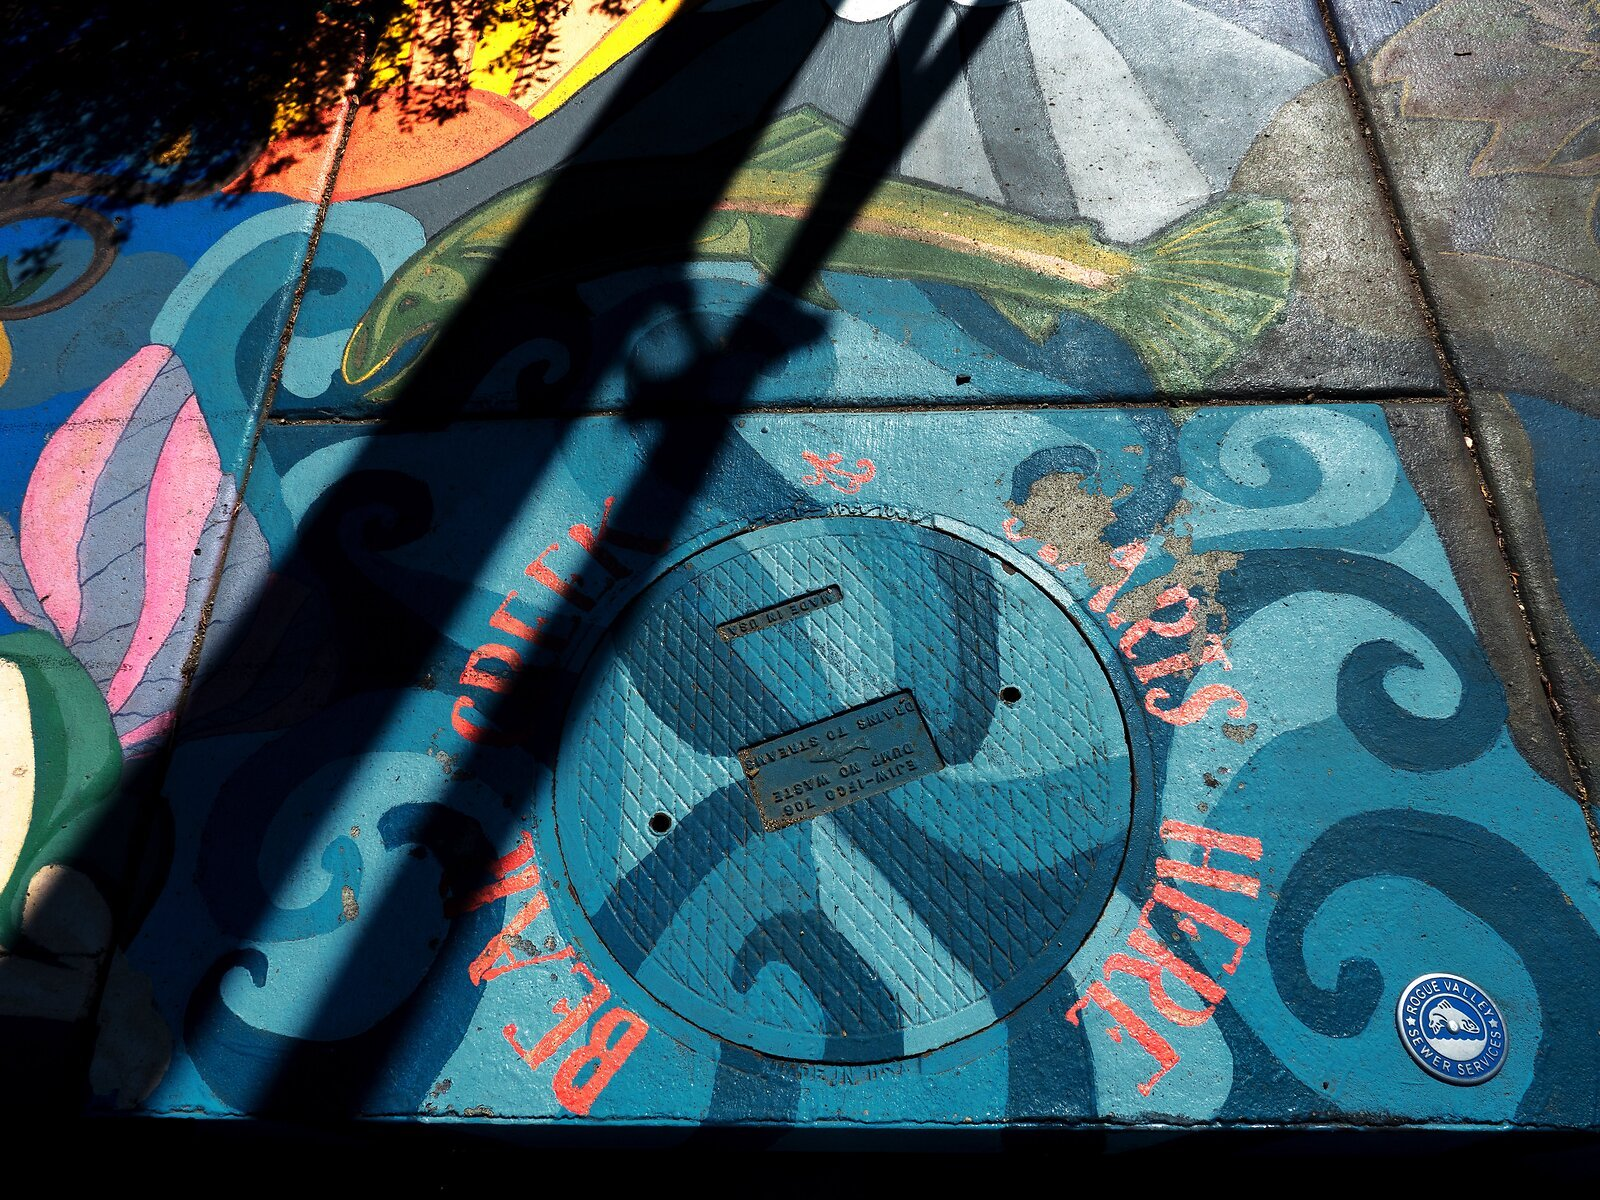 GX9_May13_21_Sidewalk_Mural.jpg